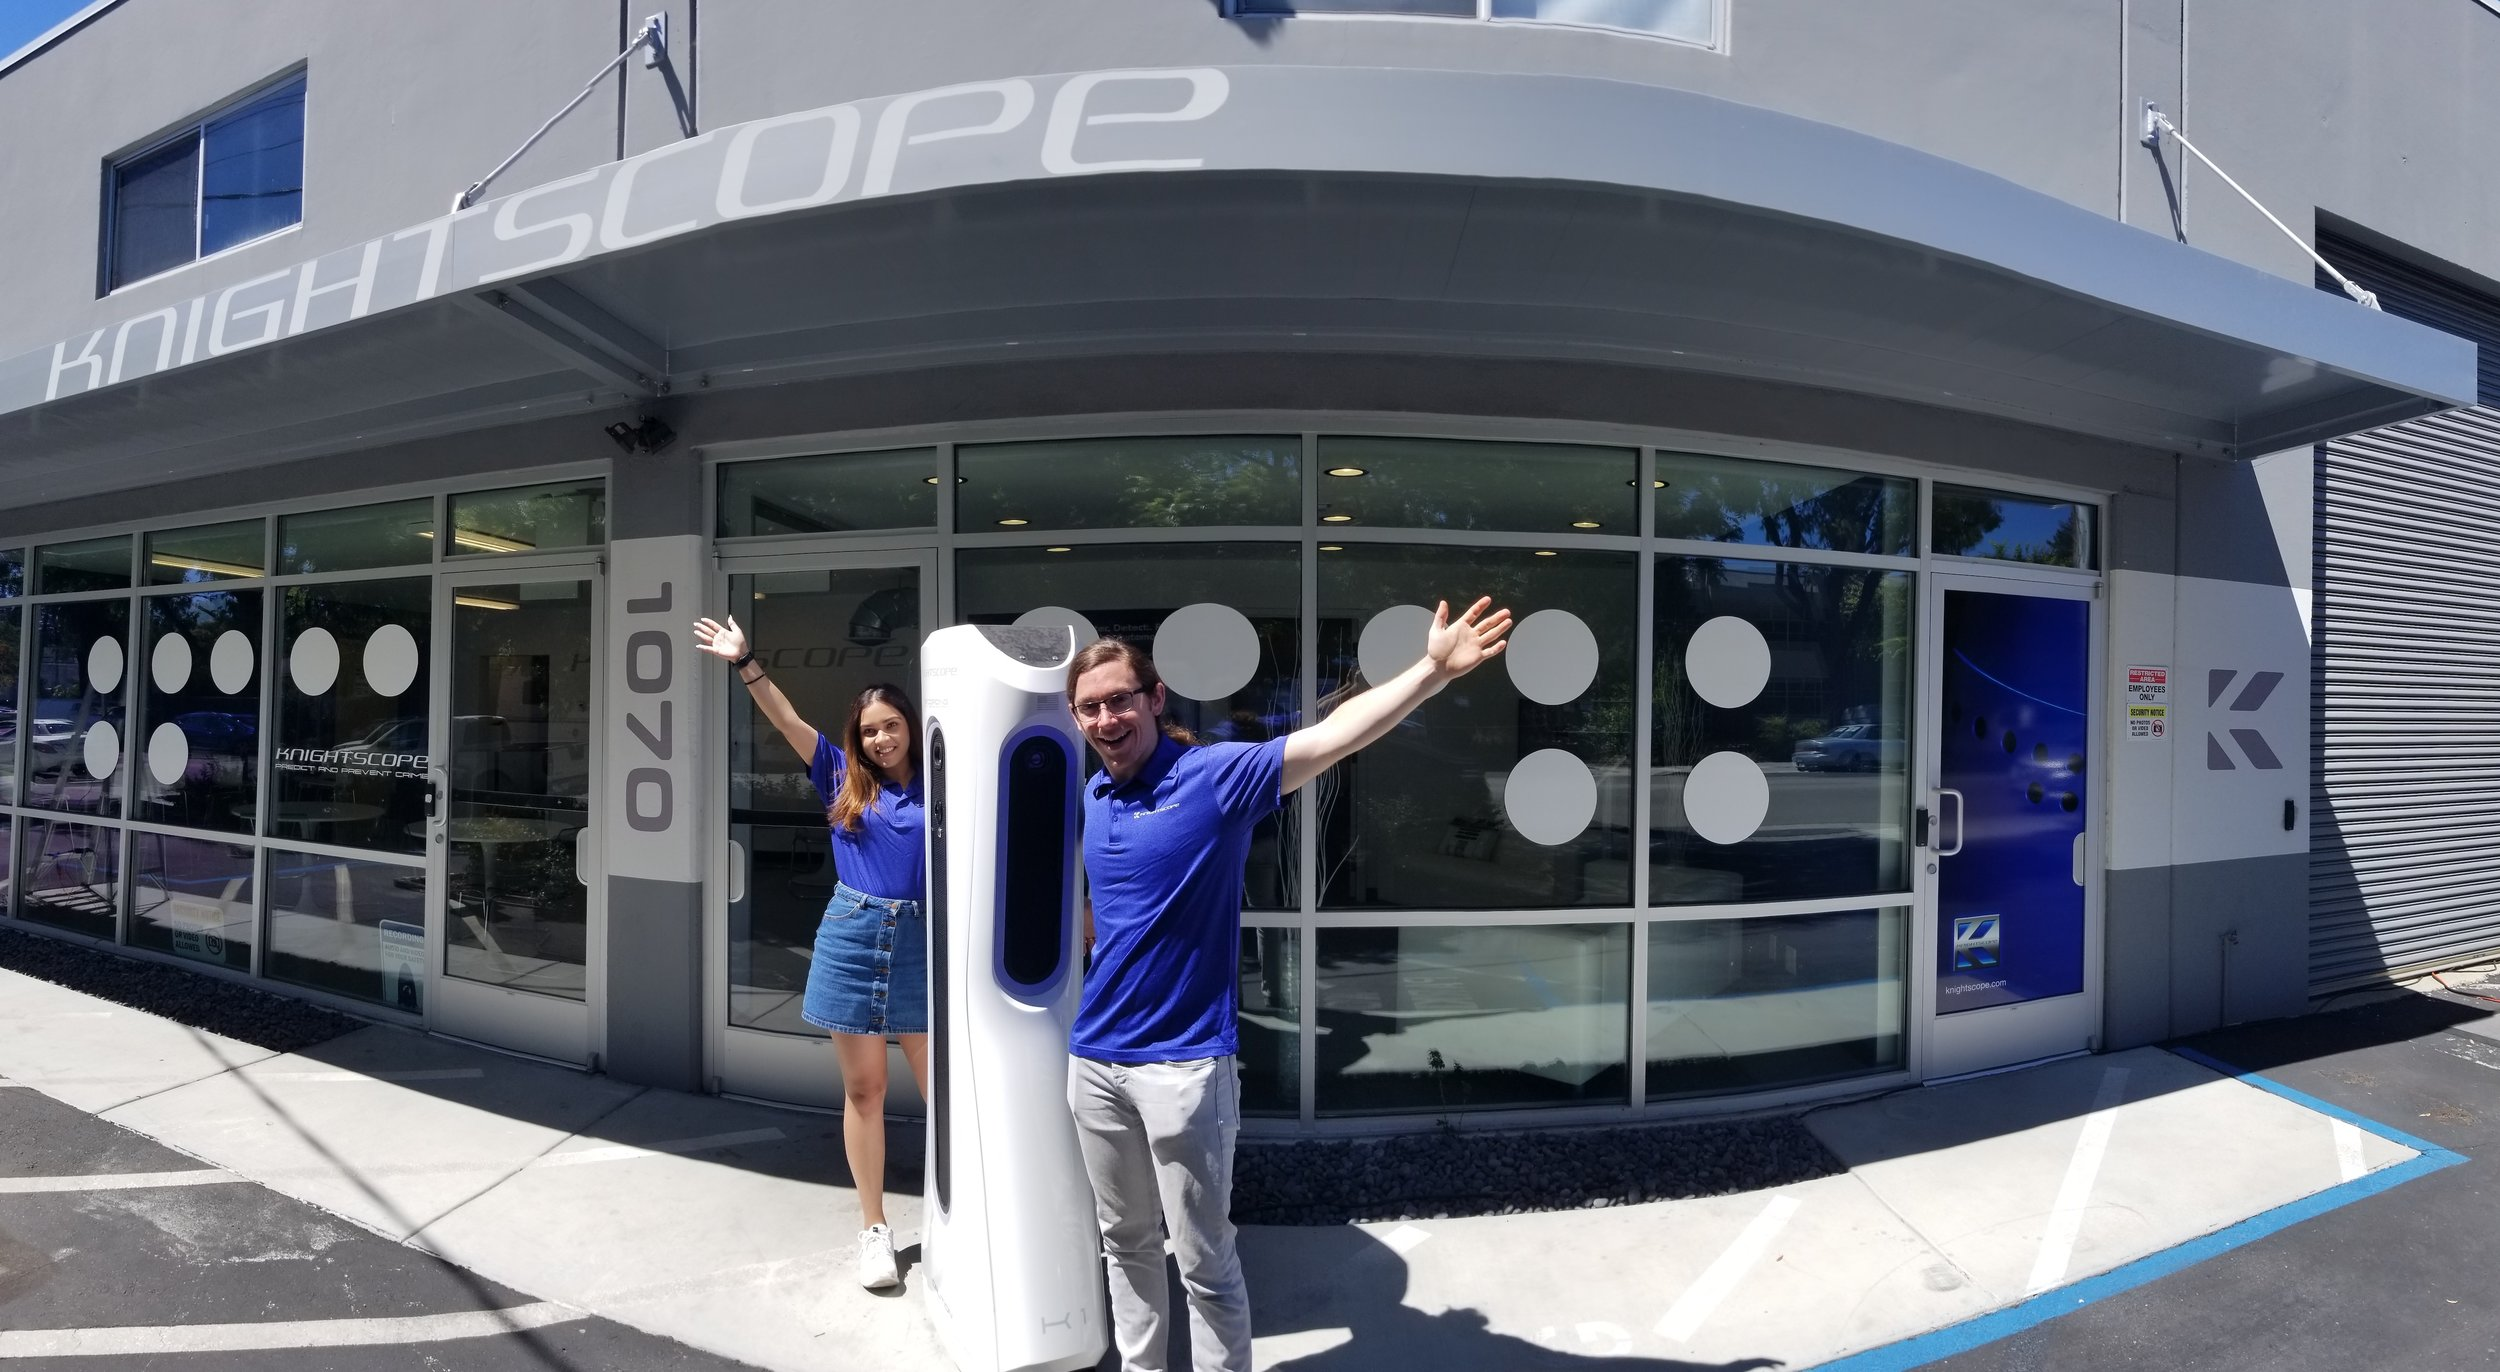 PHOTO (left to right): Shivani Singh, the K1 Stationary ADM, and Matt Condino at Knightscope Headquarters in Mountain View, California